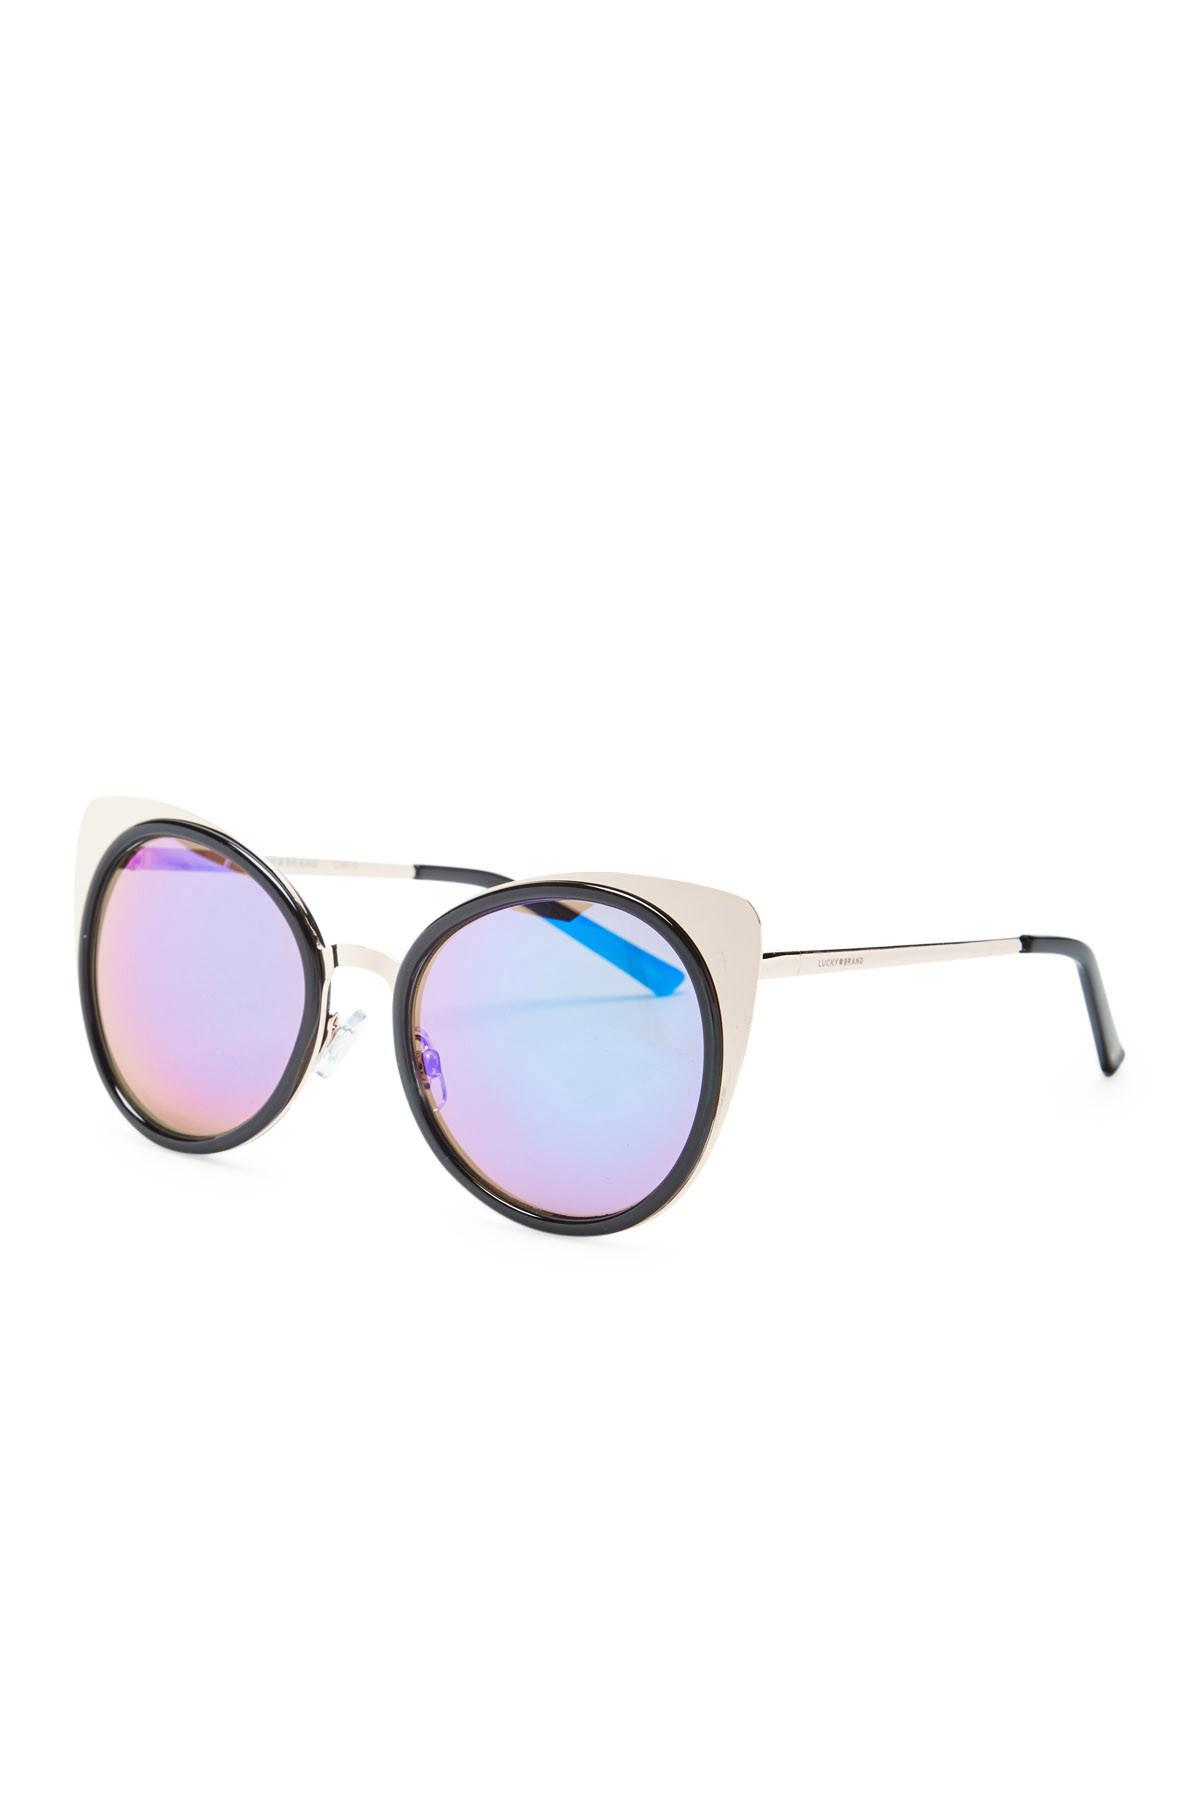 a026cf0219c5 Ocean Australia Polarized Sunglasses « One More Soul